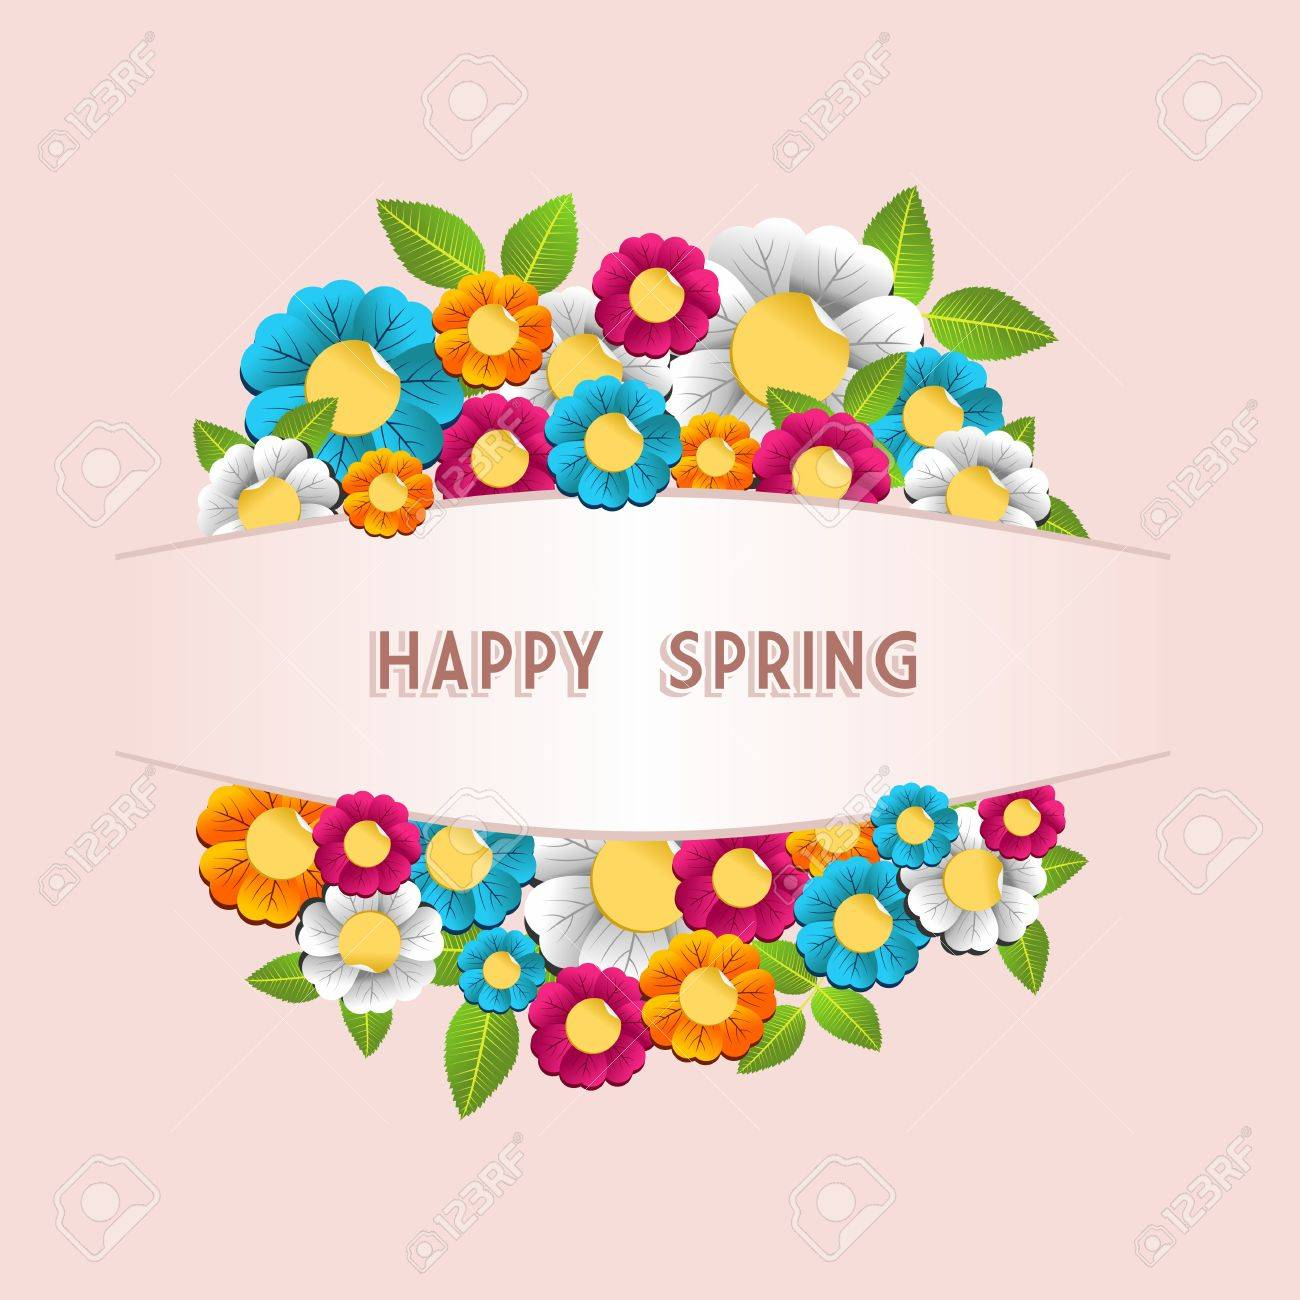 Bunte Frühlingsblumen Postkarte Hintergrund. Vektor-Illustration Für ...